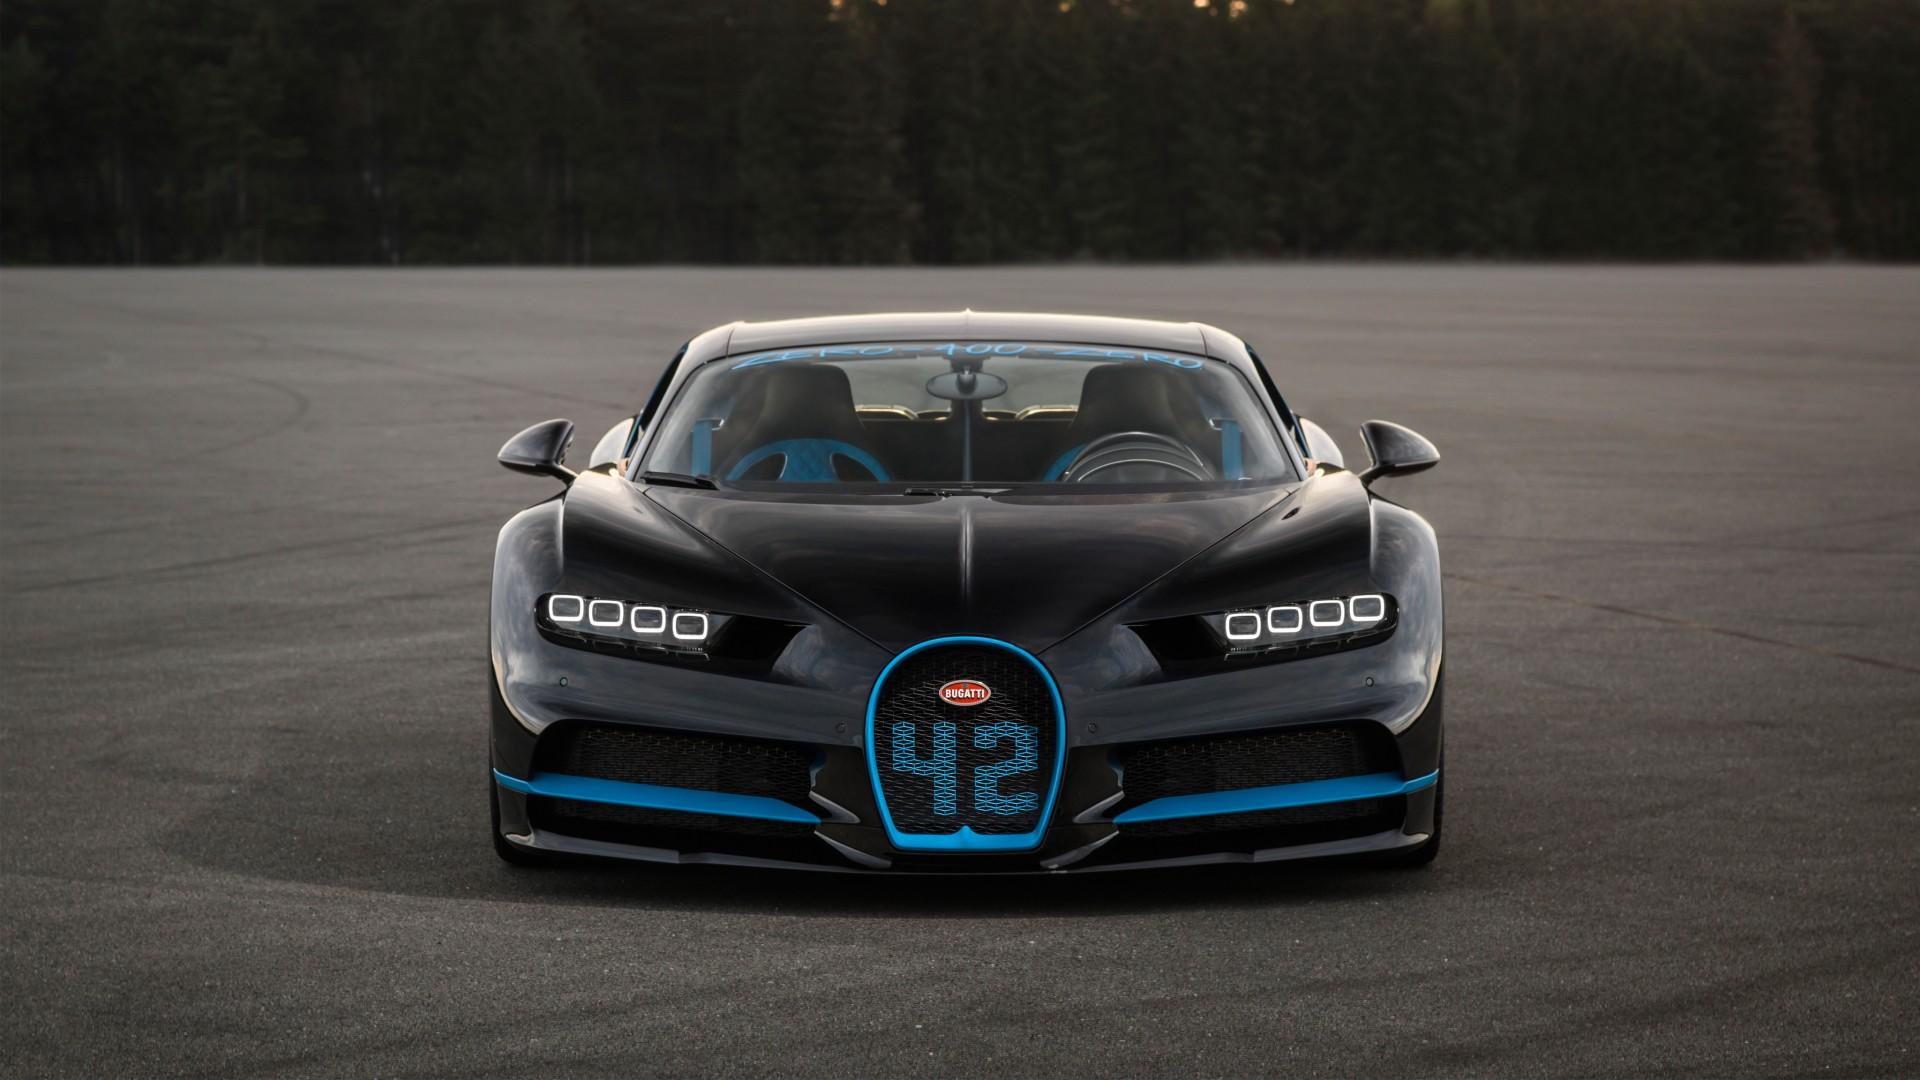 2017 Bugatti Chiron Zero 400 Zero 4K Wallpaper